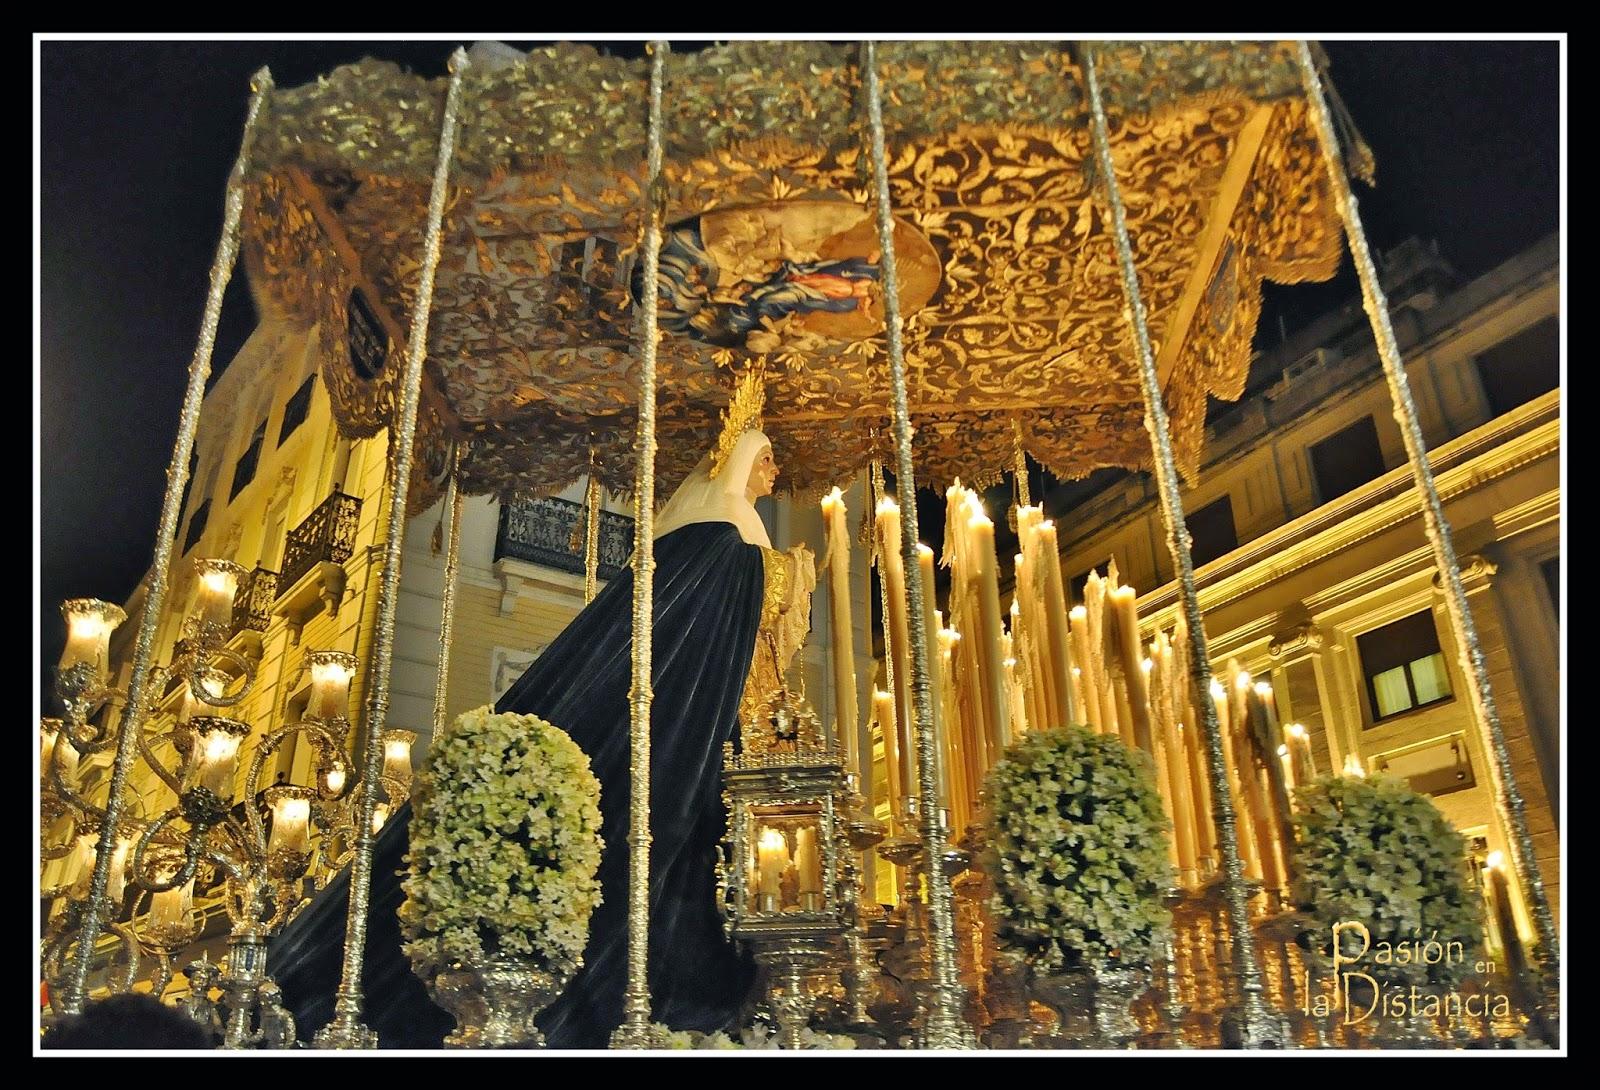 Fotos-Hermandad-Museo-Semana-Santa-2015